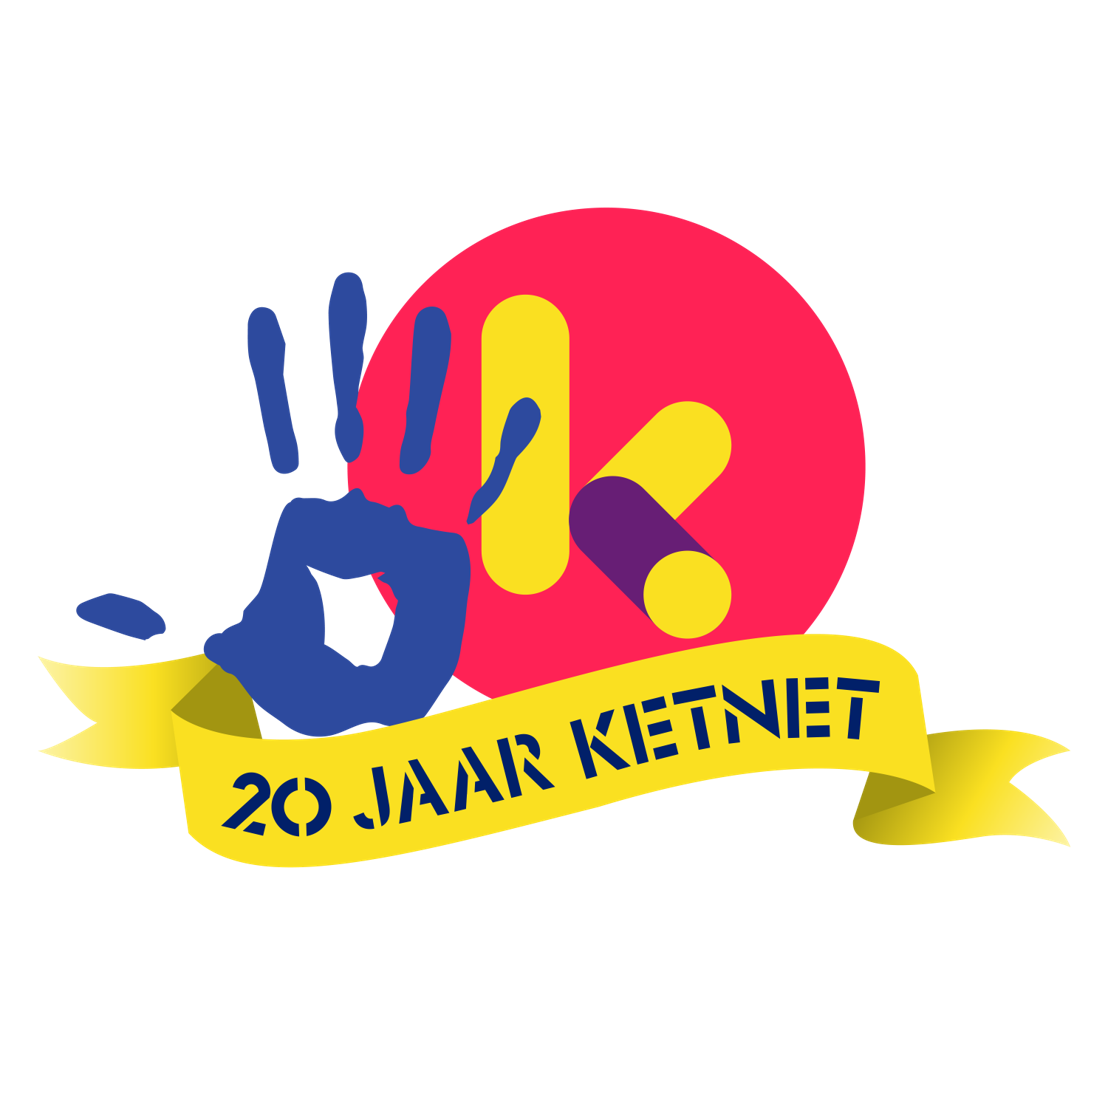 (c) Logo - 20 jaar Ketnet